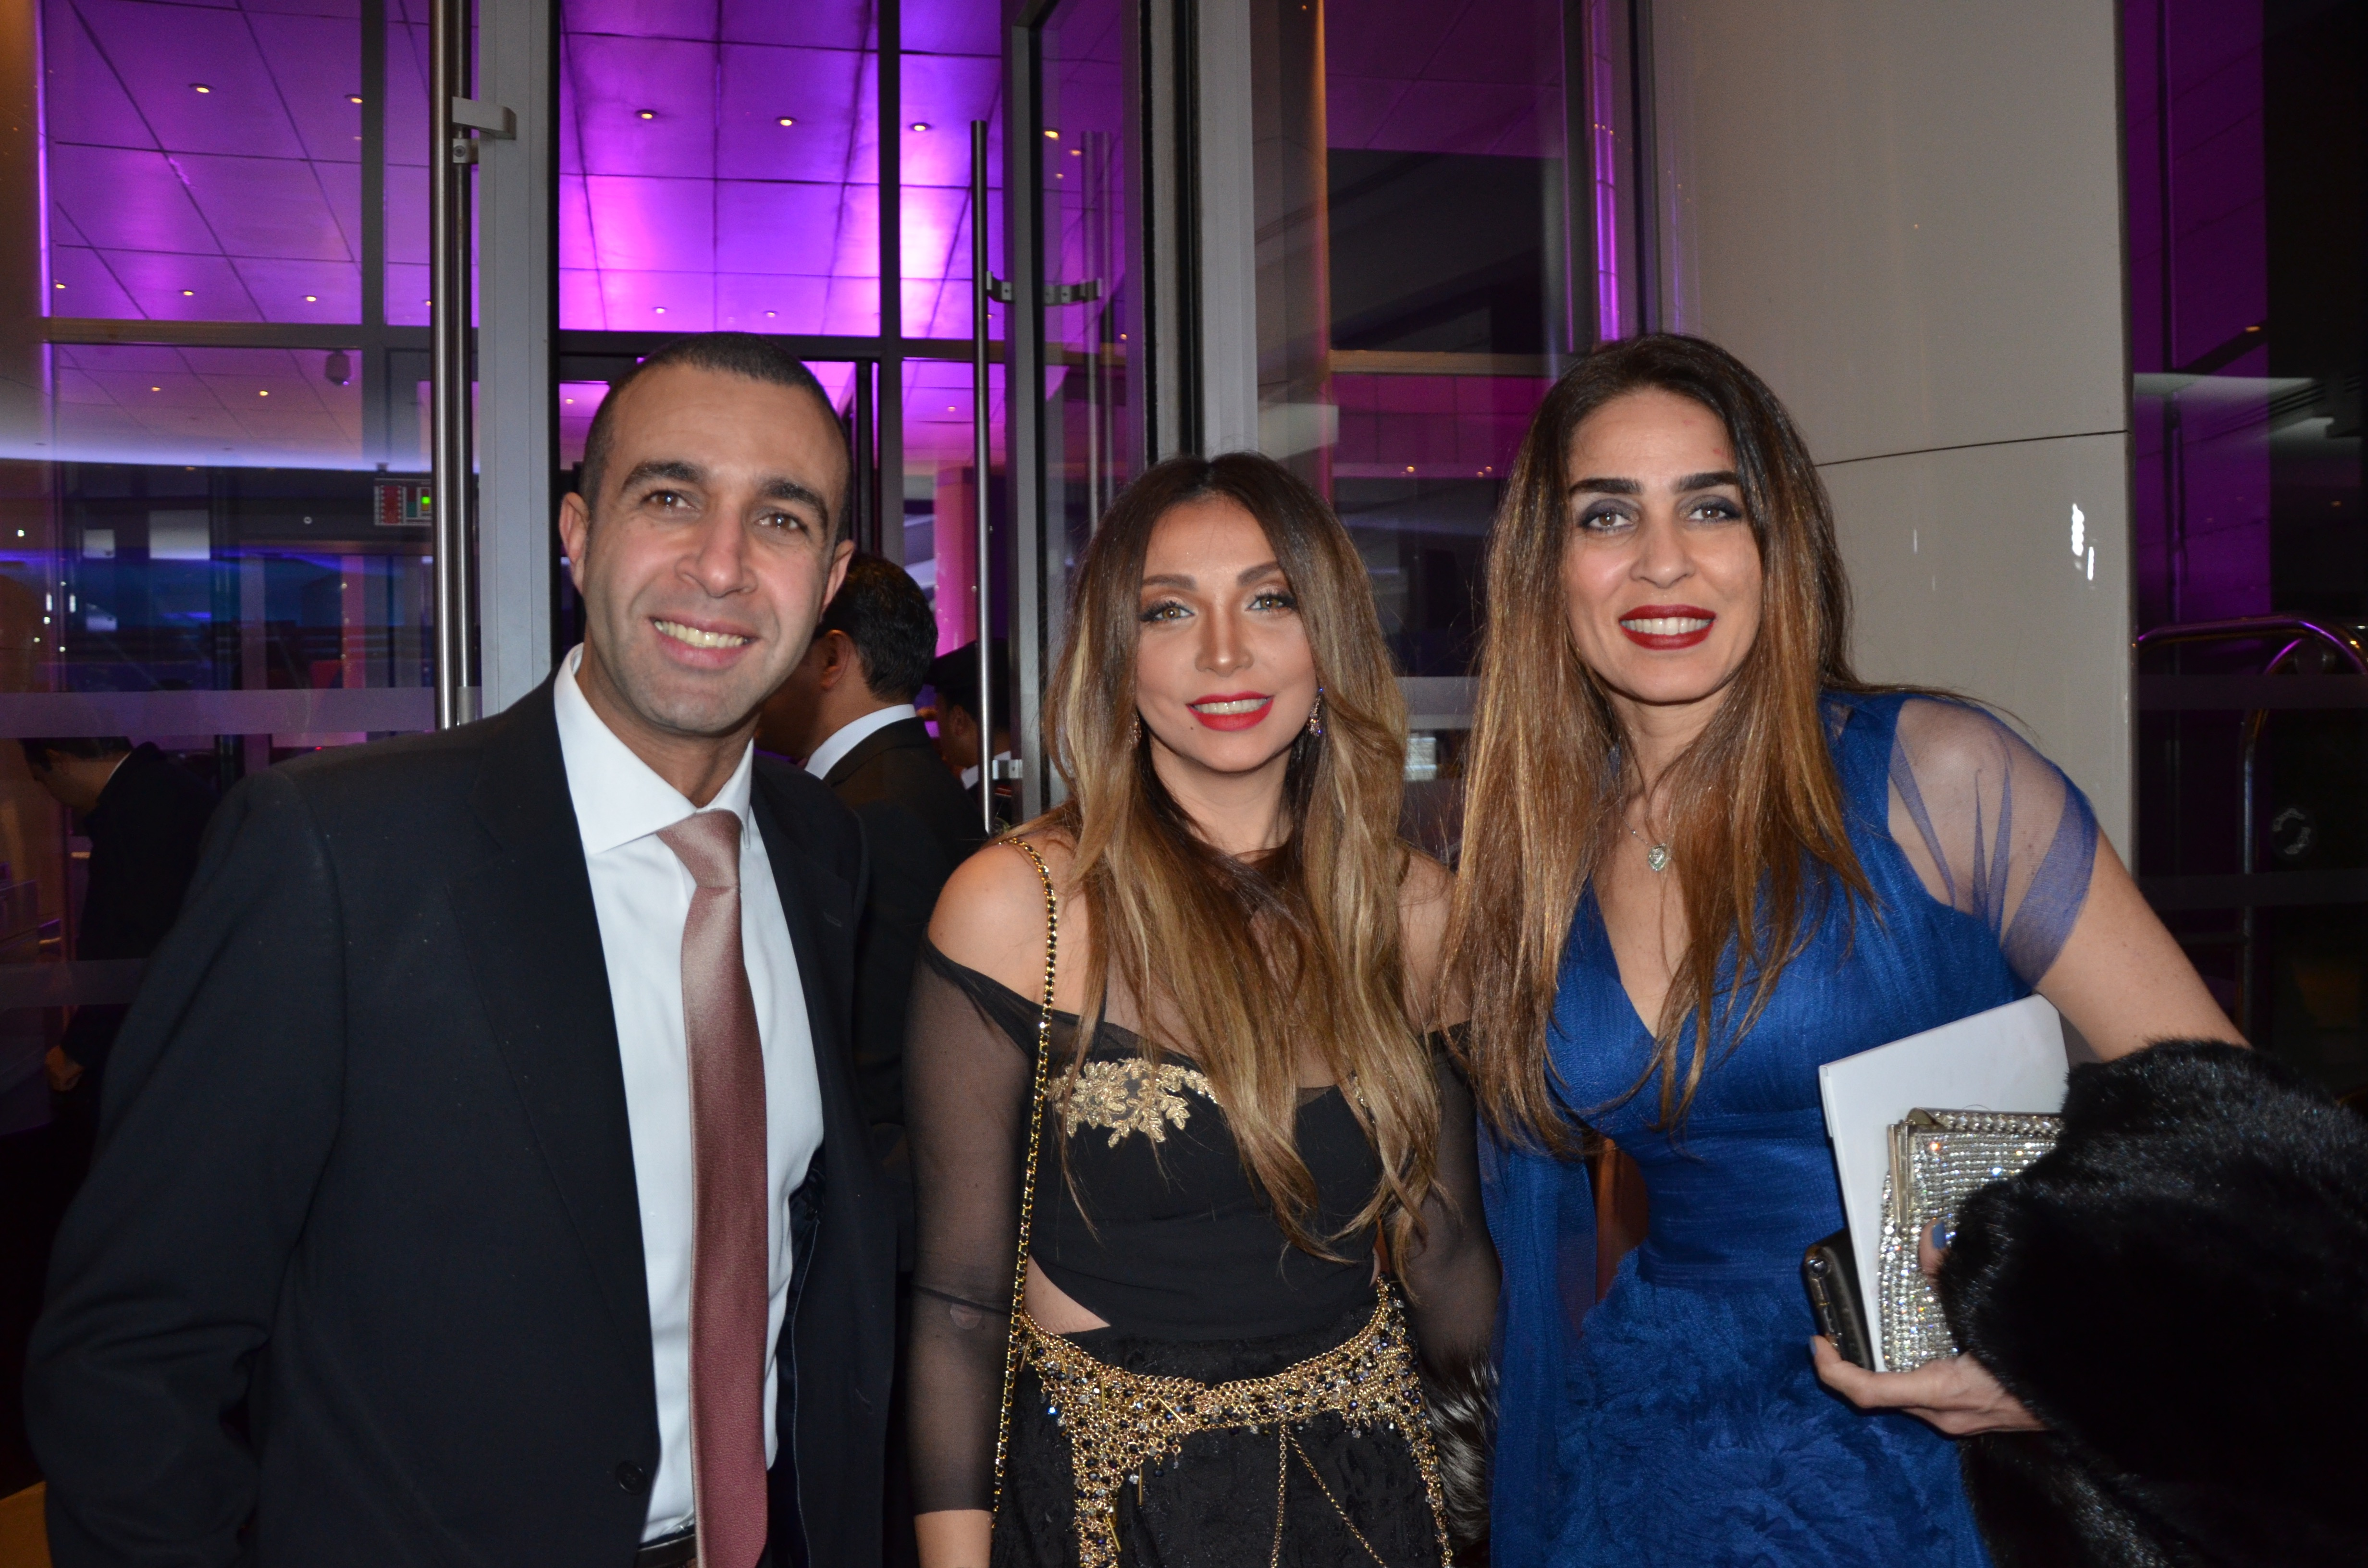 Khalid Galal and his wife with Yasmine El Hosseini